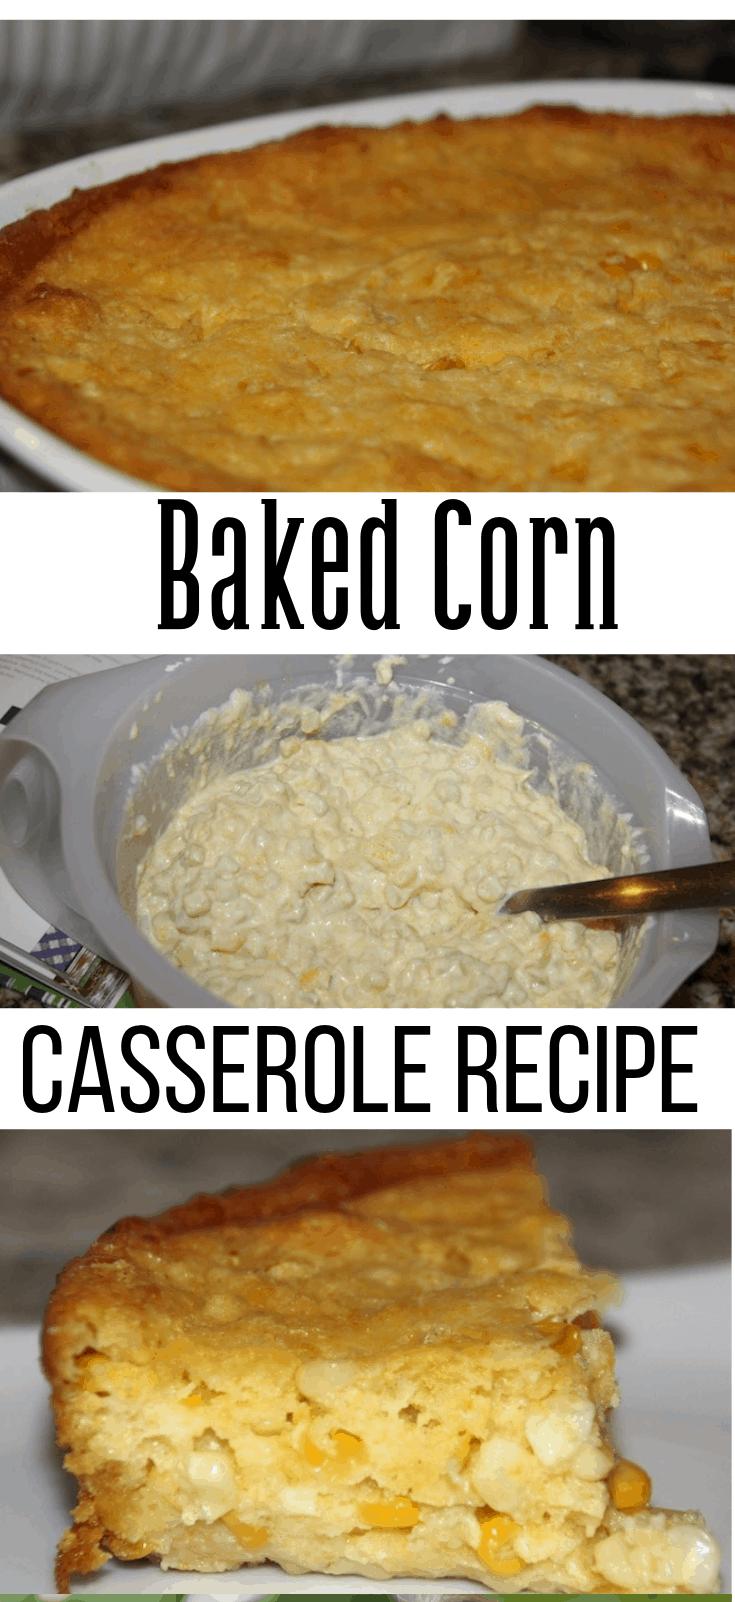 Baked Corn Casserole Recipe